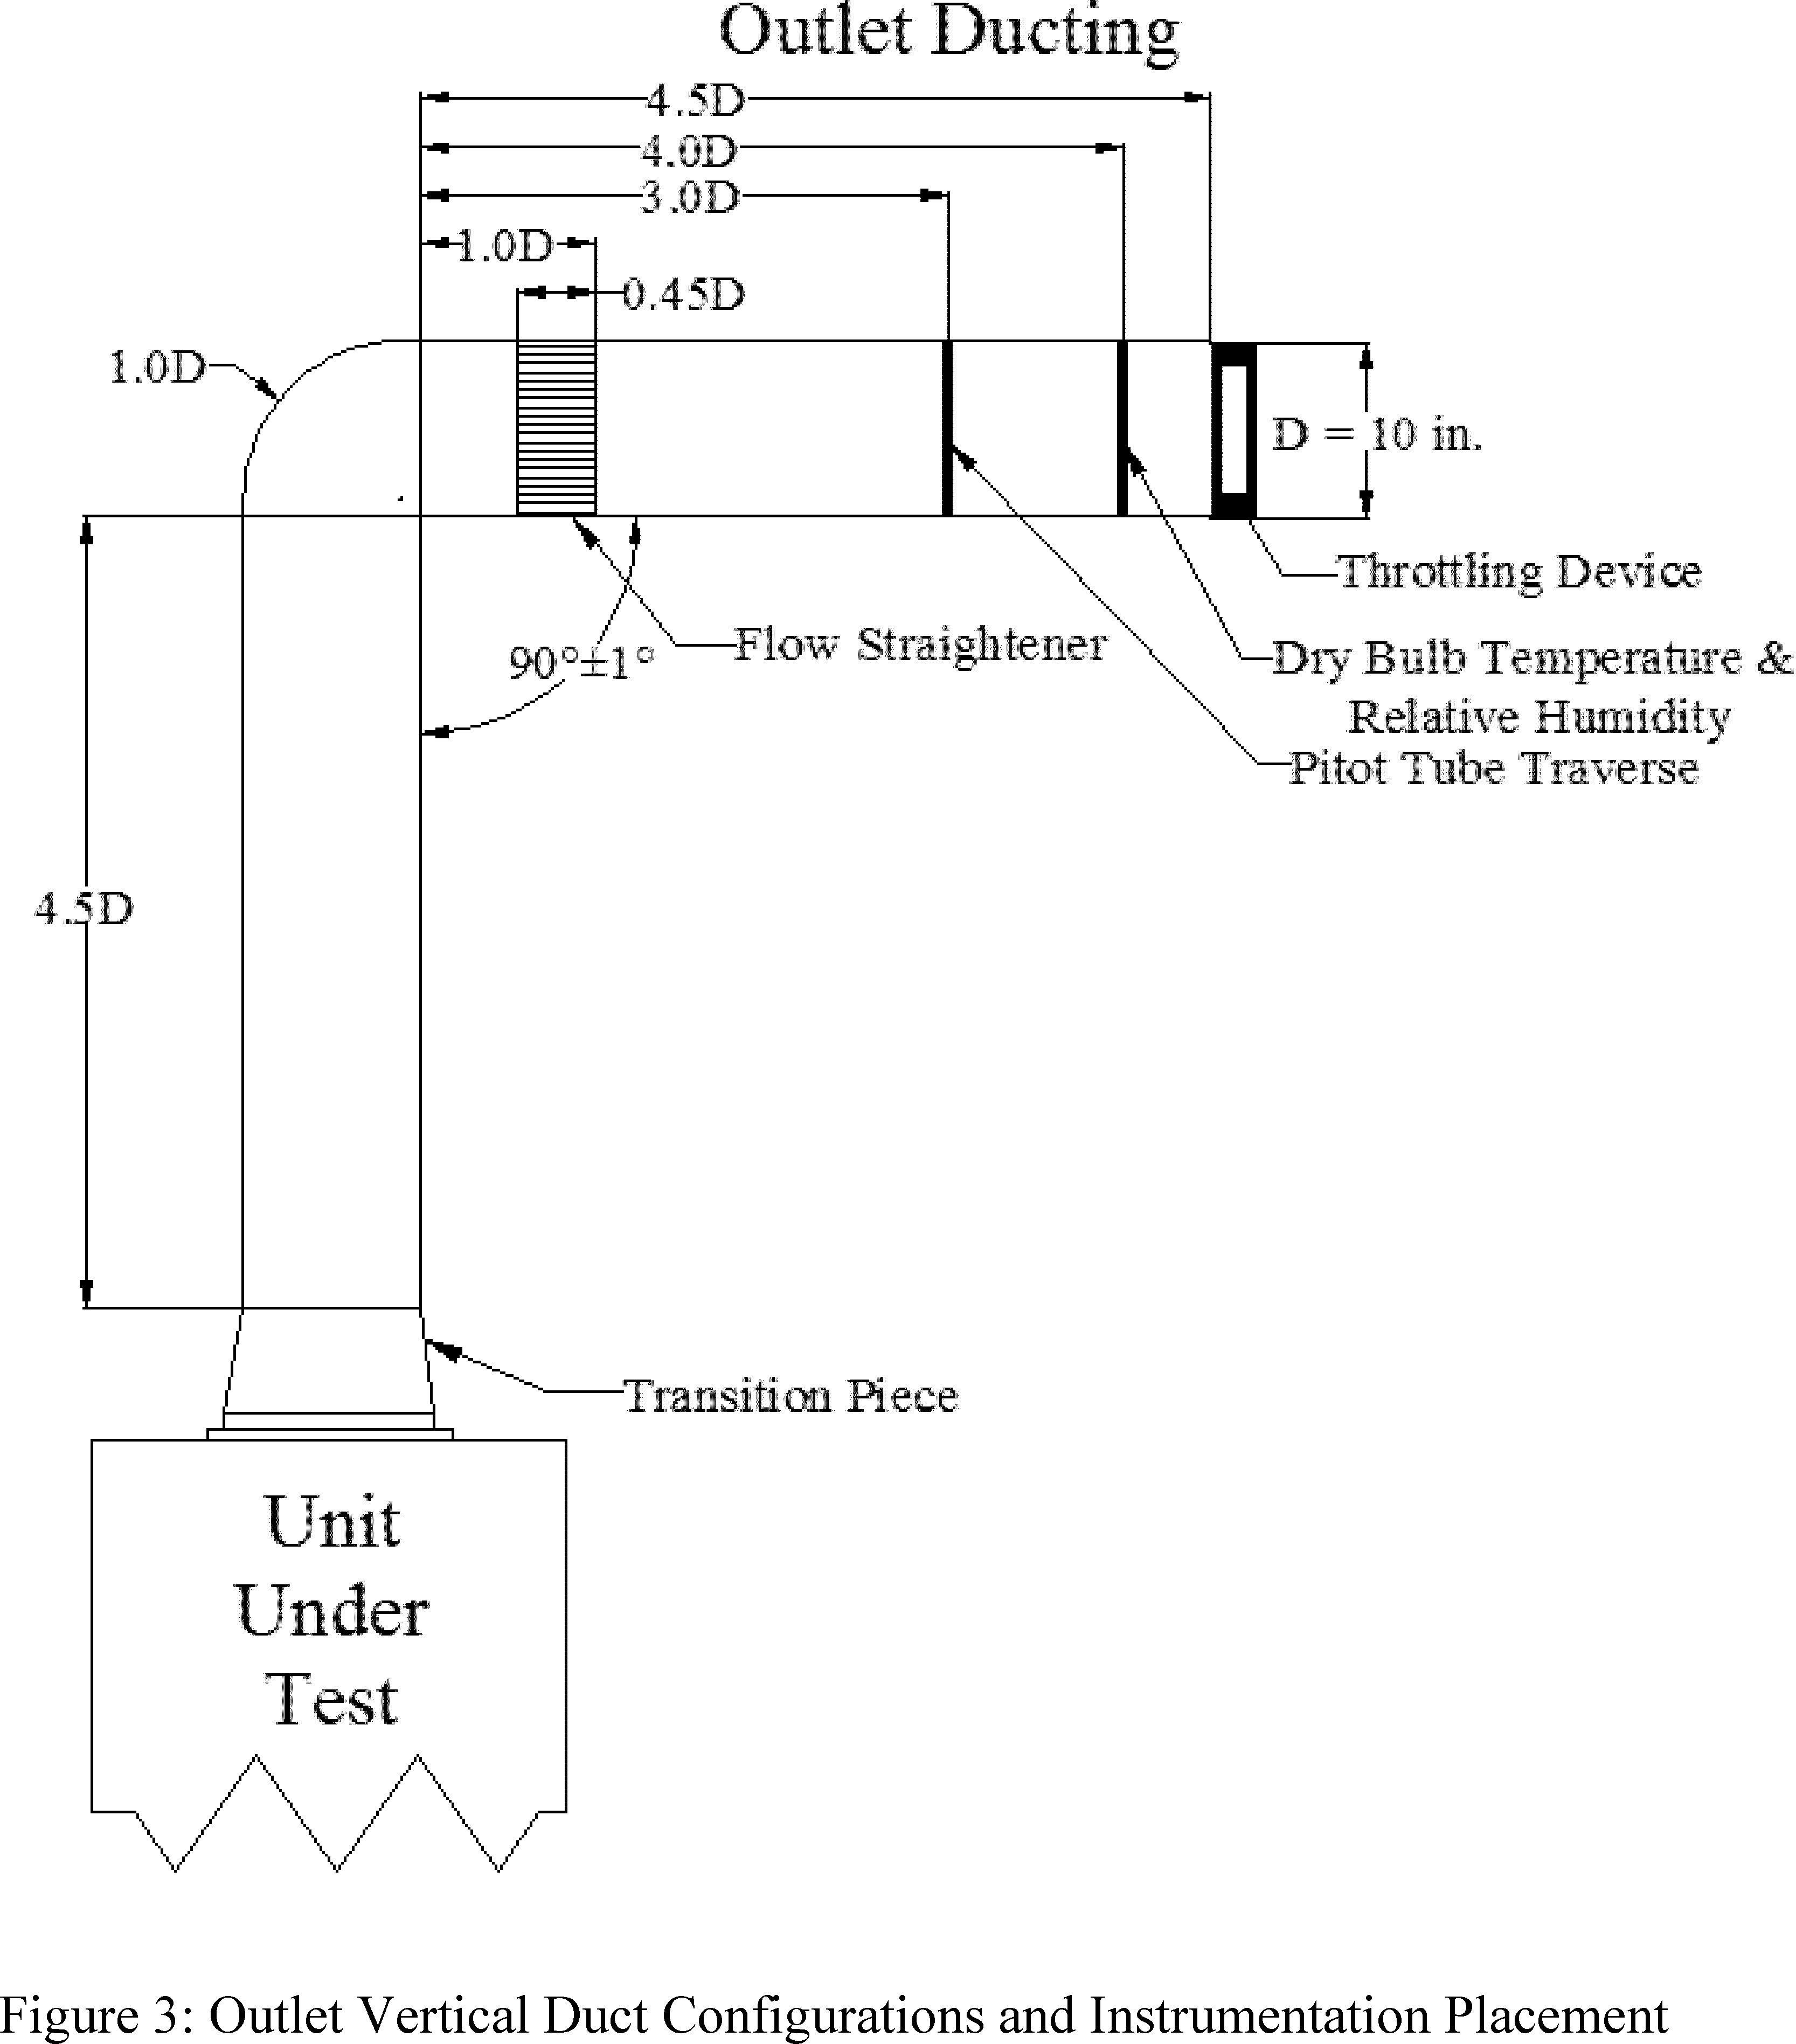 4 Wire Trailer Diagram Household Male Plug Wiring Diagram Of 4 Wire Trailer Diagram Xf Alternator Wiring Diagram